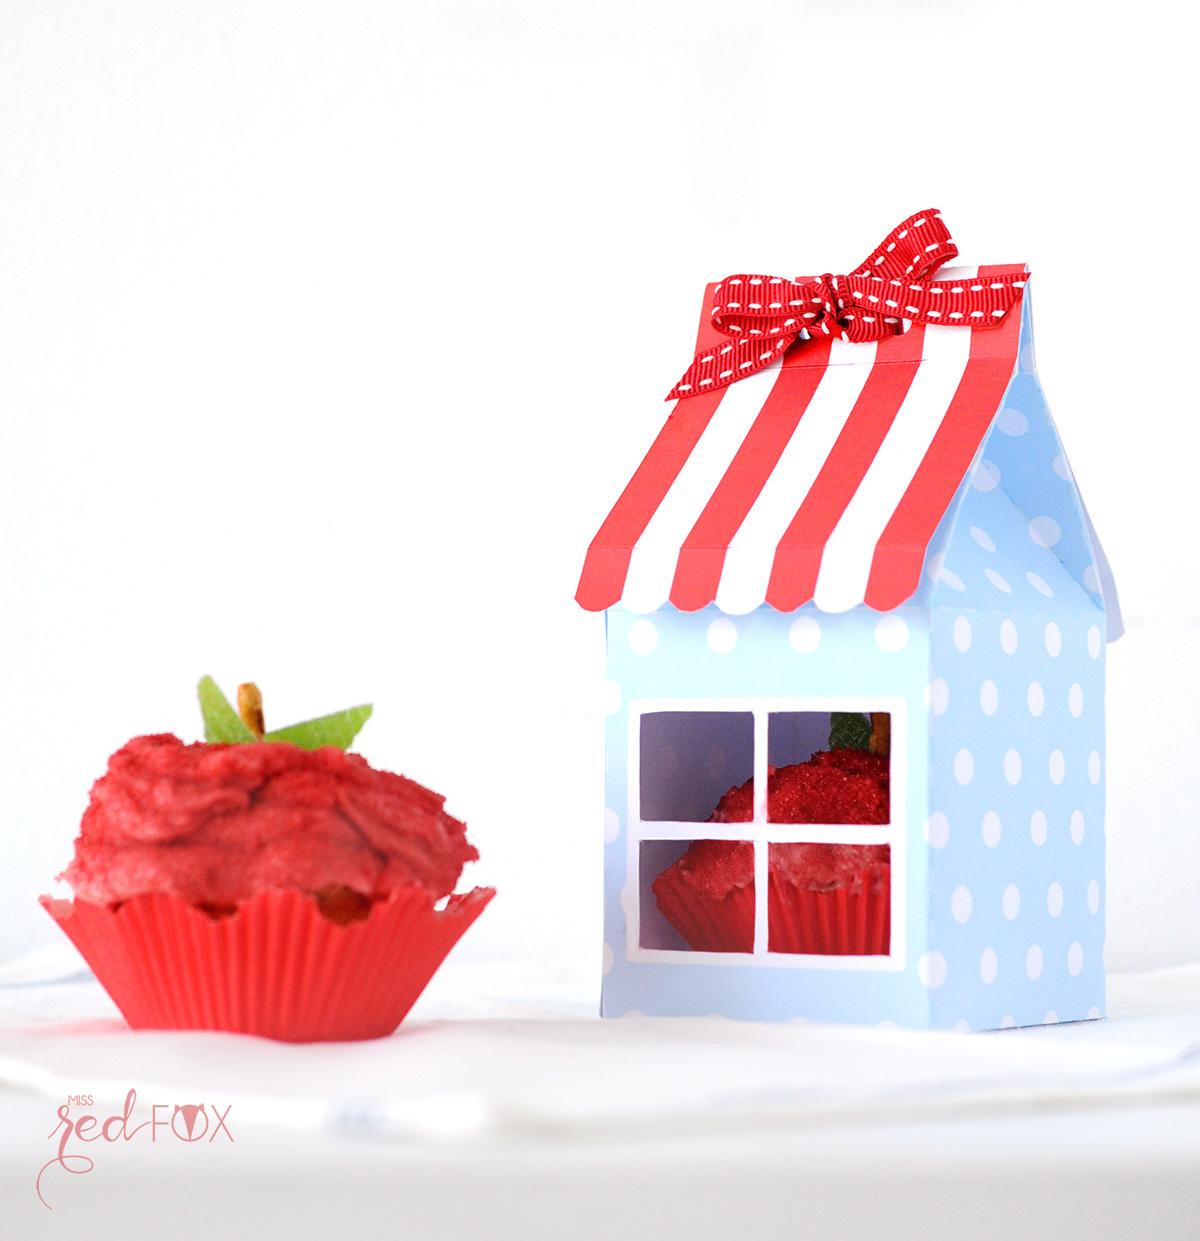 missredfox - 12giftswithlove - 10 - Süßes Geschenk - Apfel Cupcake mit Haus Verpackung - 01